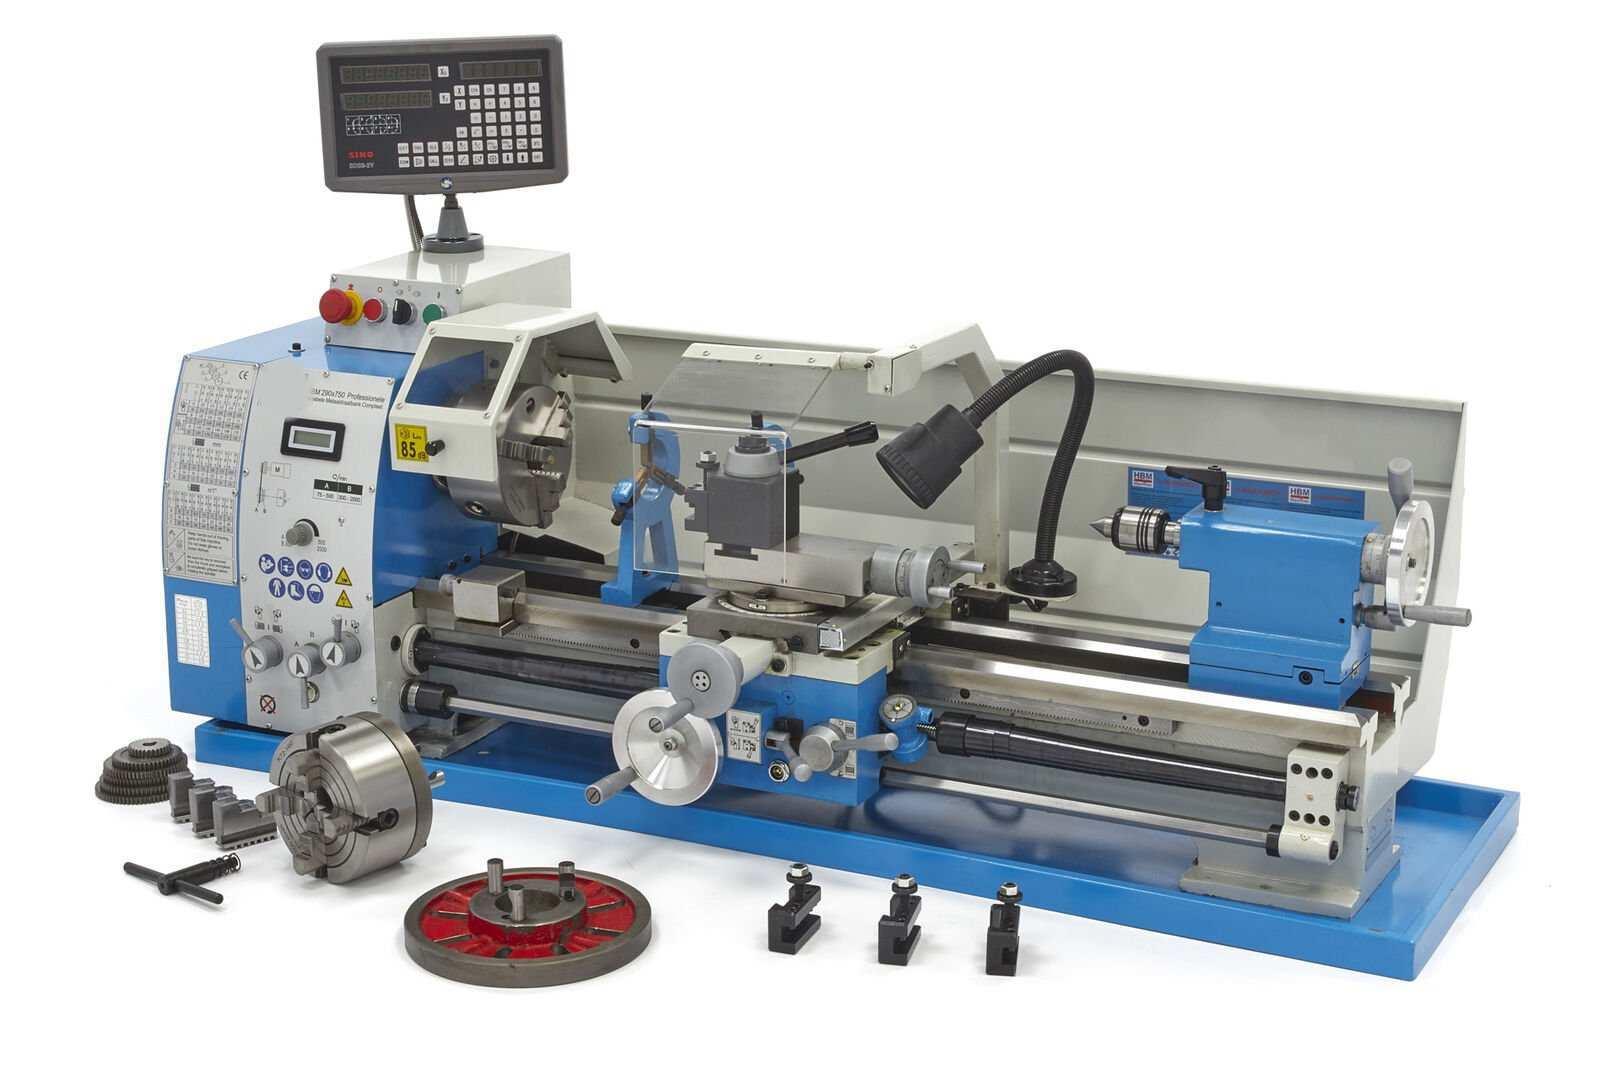 Drehmaschine 290 V F Dro Zur Metallbearbe Ink